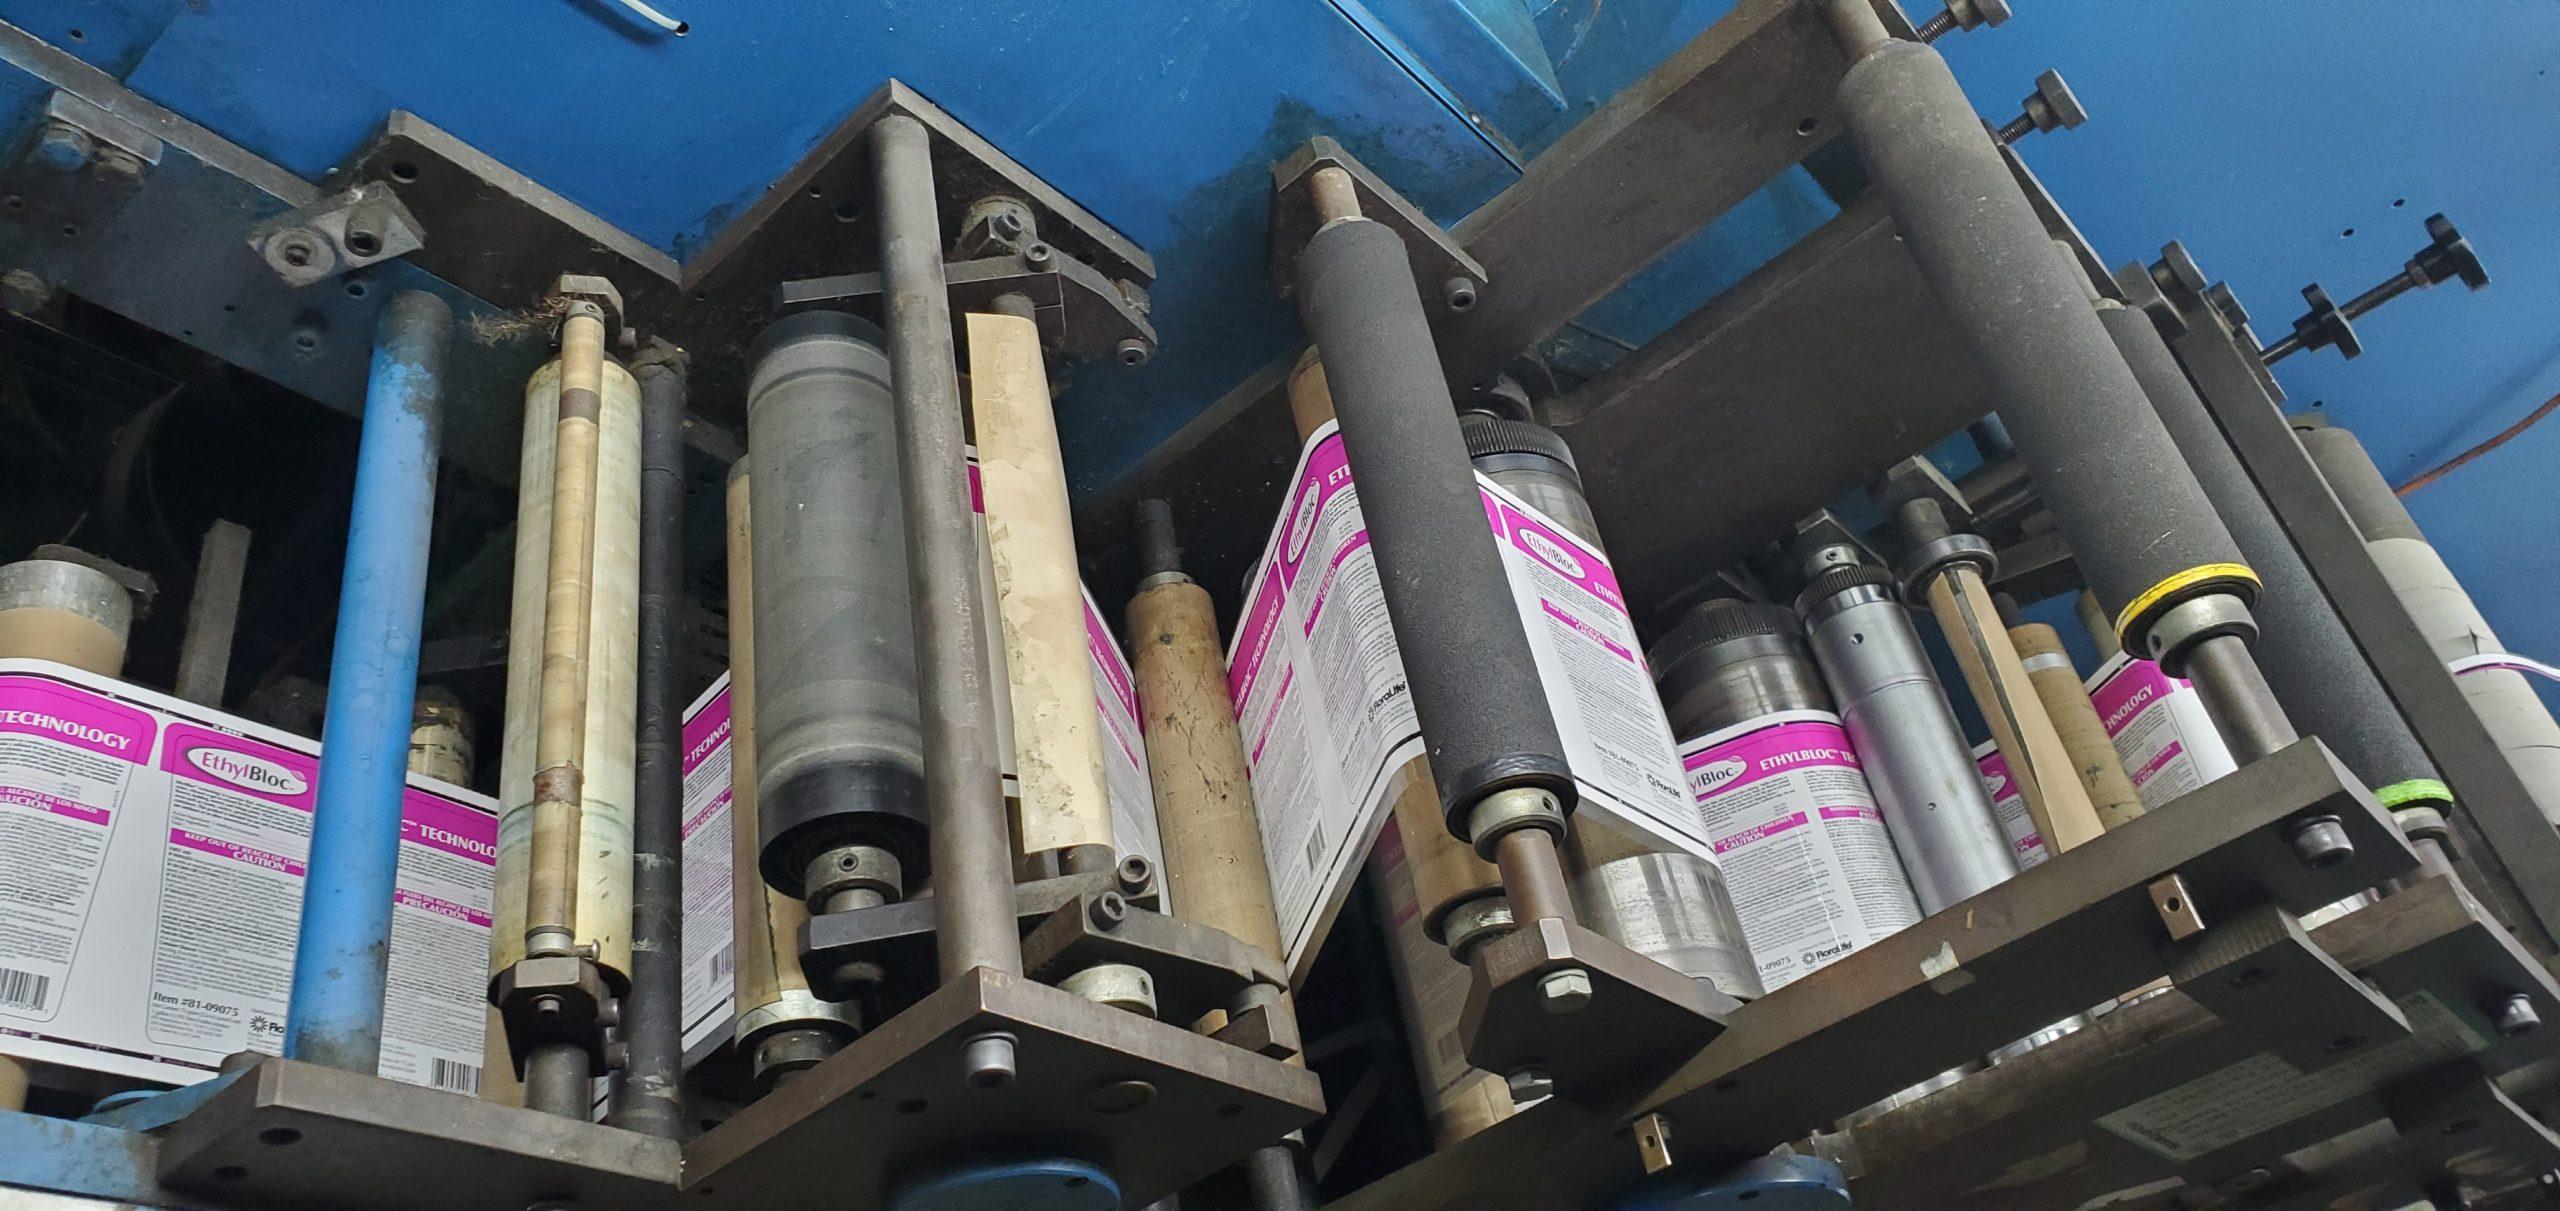 Aquaflex LWSP-1307 - Used Flexo Printing Presses and Used Flexographic Equipment-7